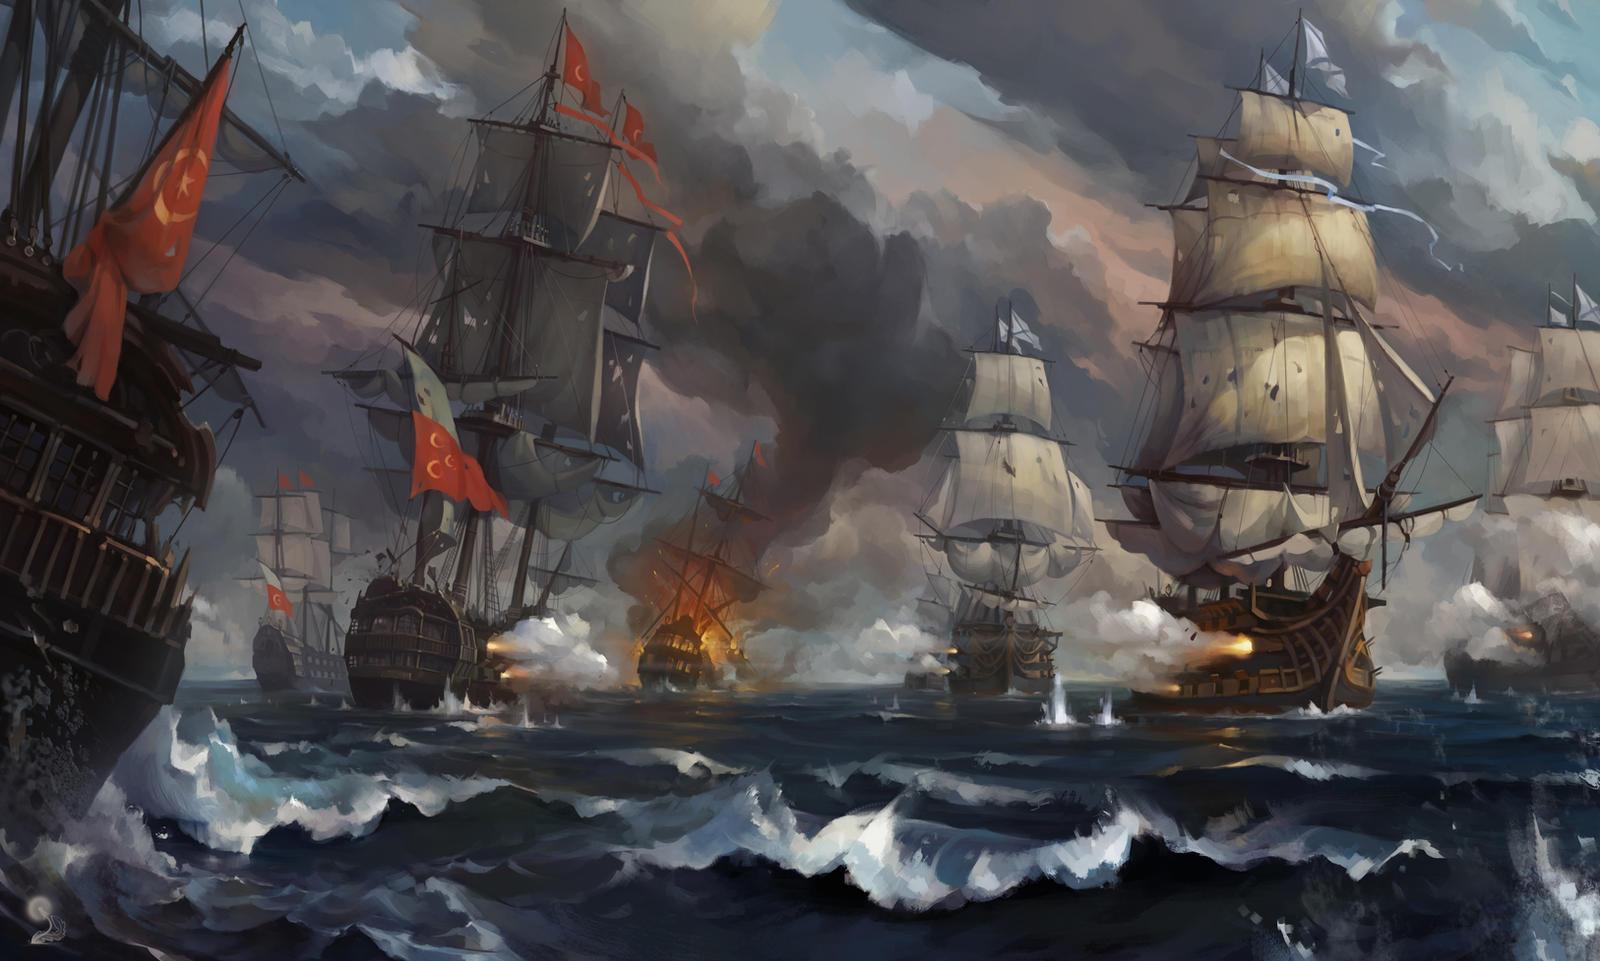 Sea Battle By Haryarti On Deviantart